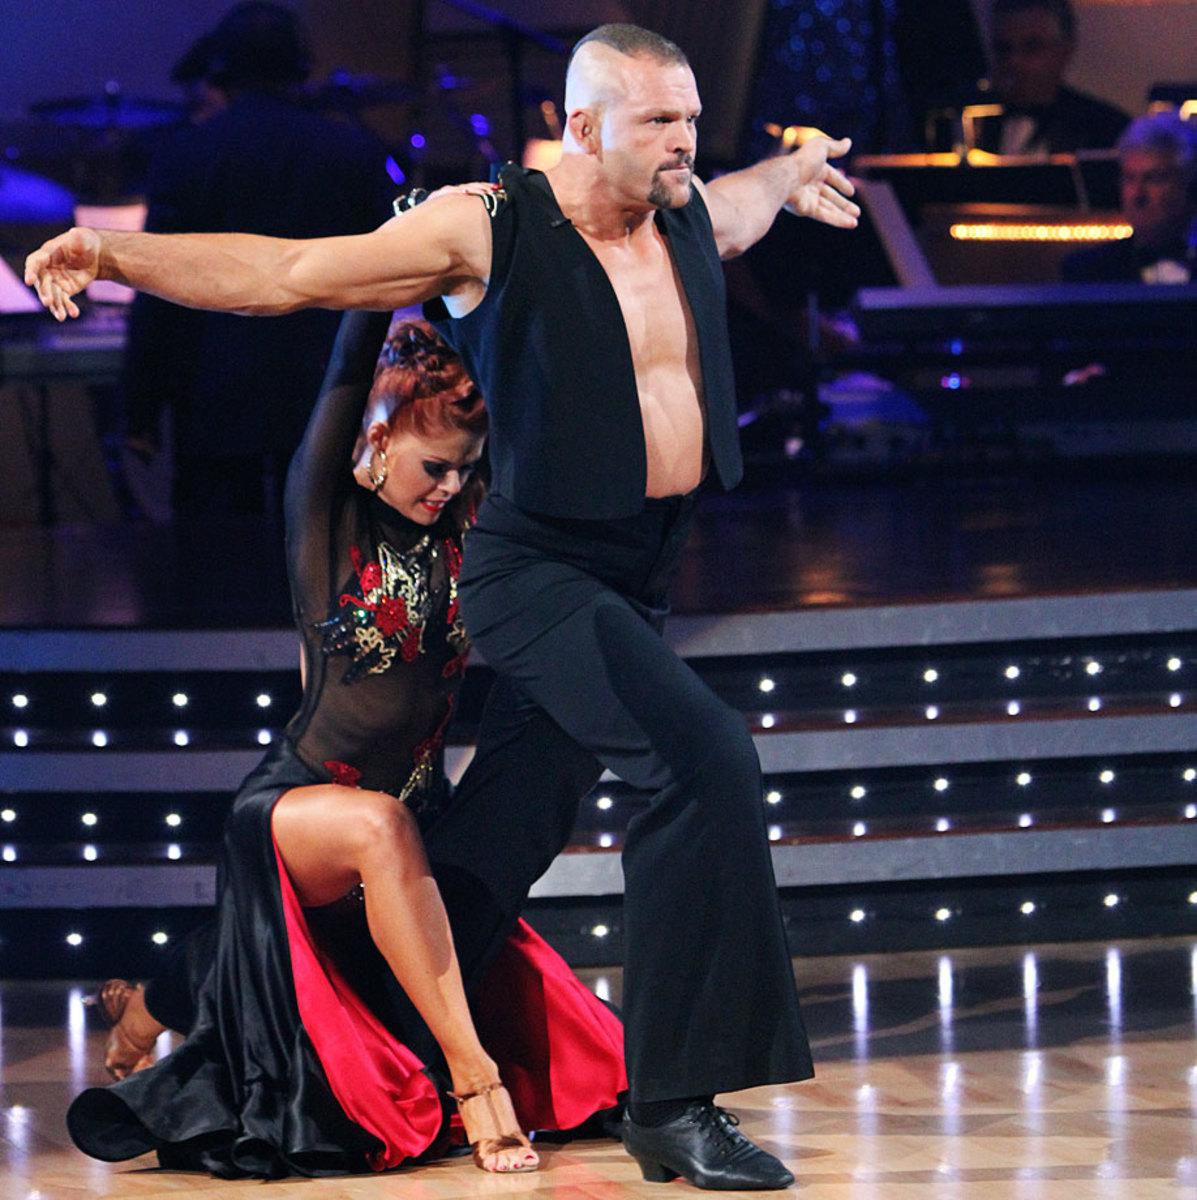 chuck-liddell-anna-trebunskaya-dancing-with-the-stars.jpg